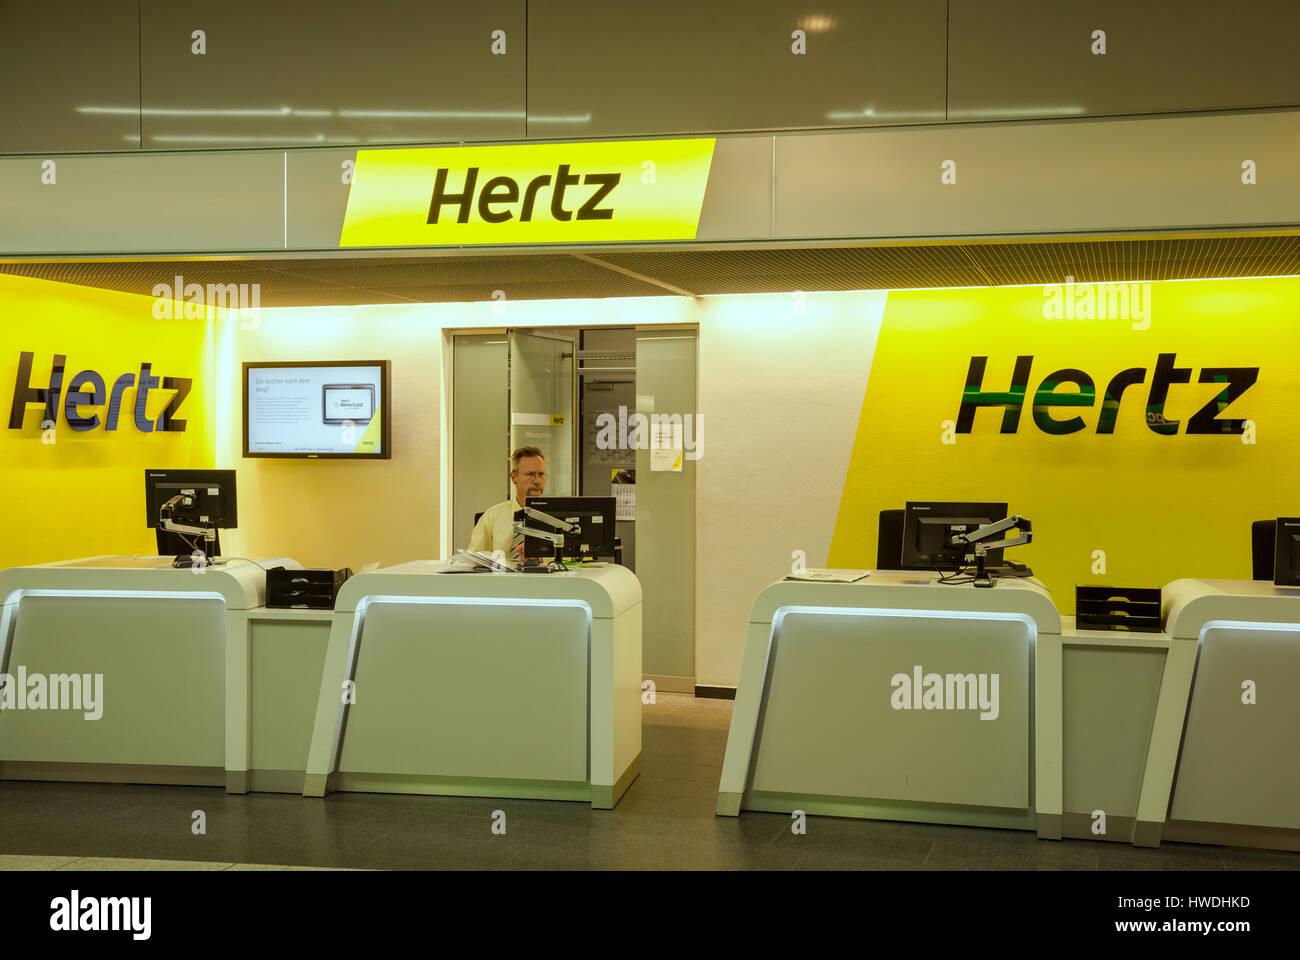 hertz rental car stock photos hertz rental car stock. Black Bedroom Furniture Sets. Home Design Ideas